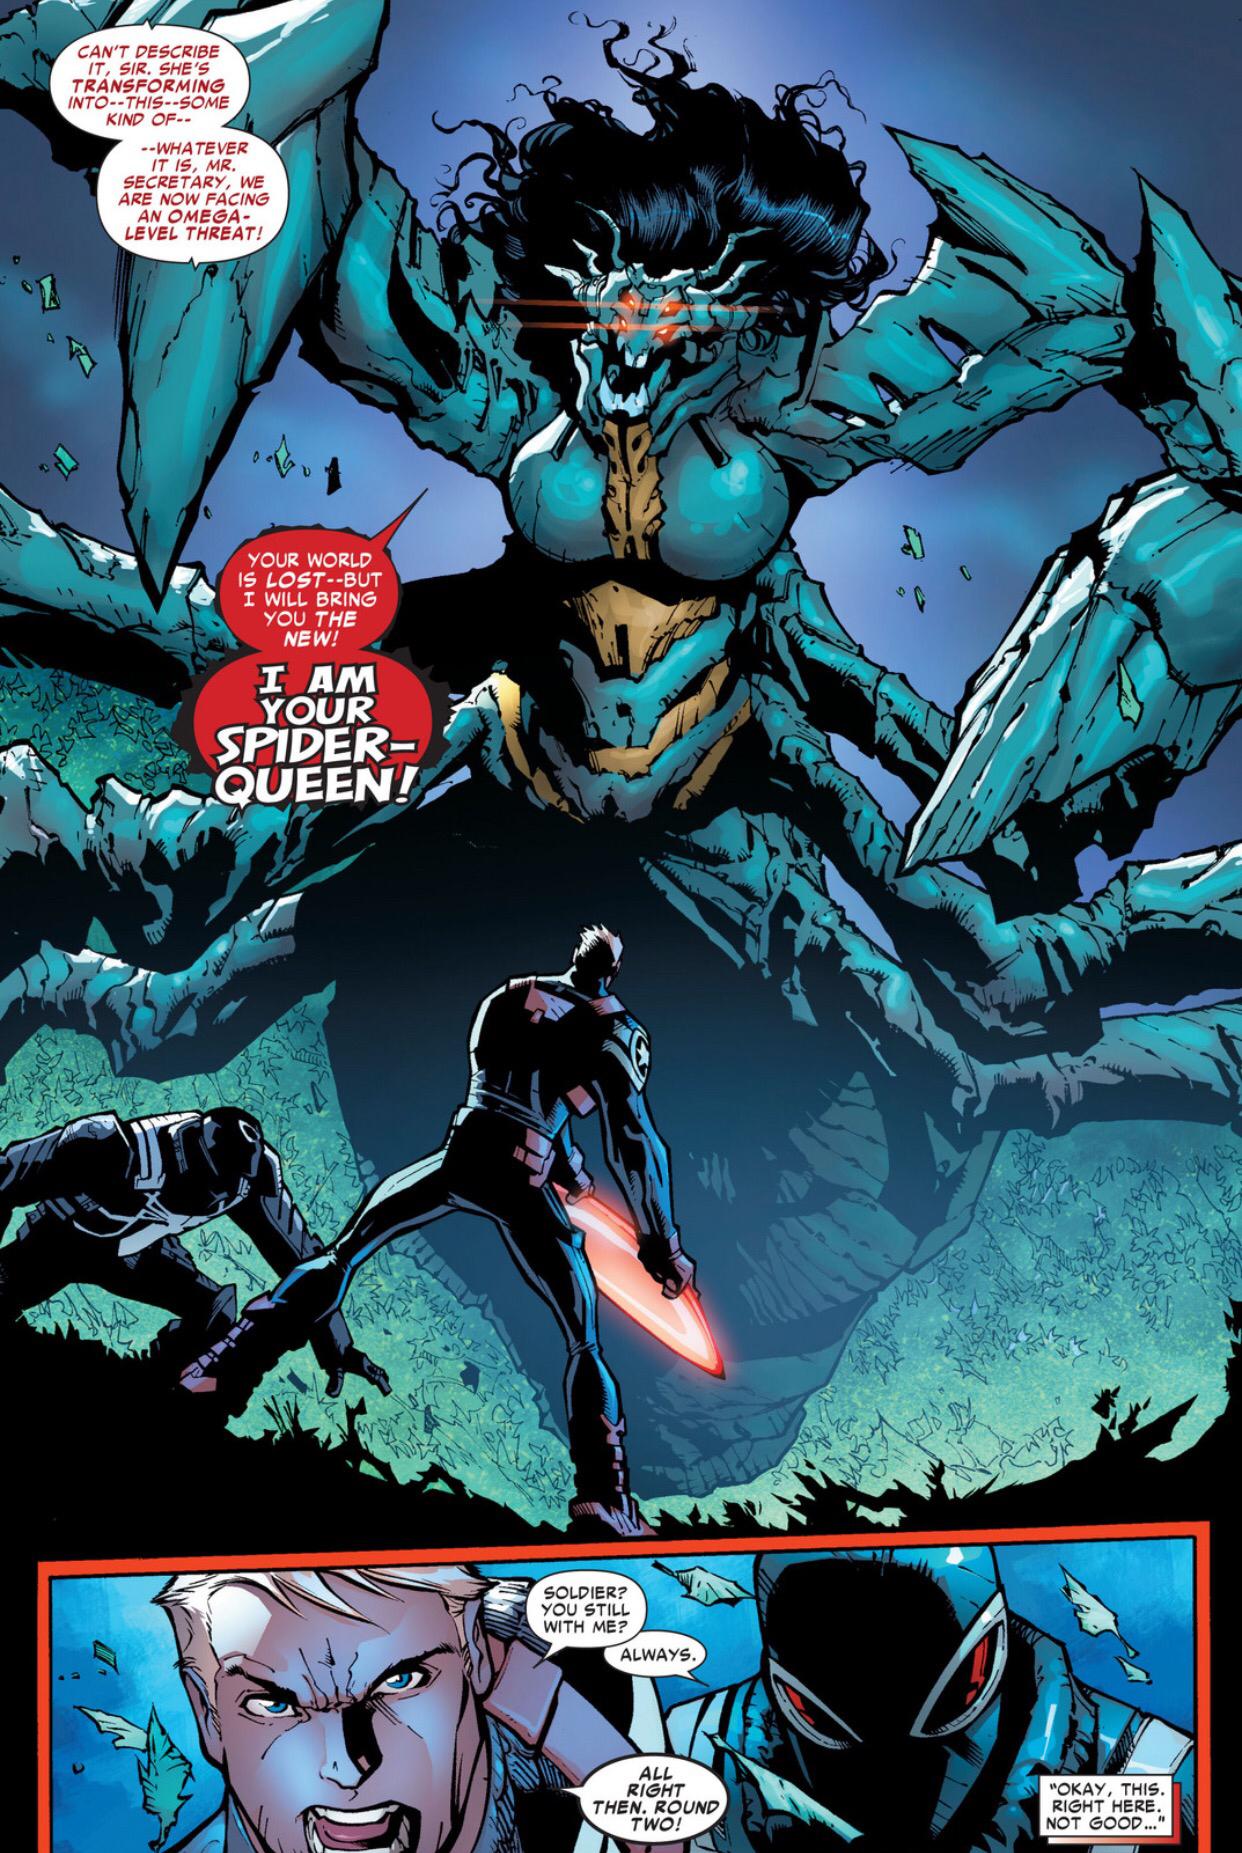 marvel comics top 5 killer queens